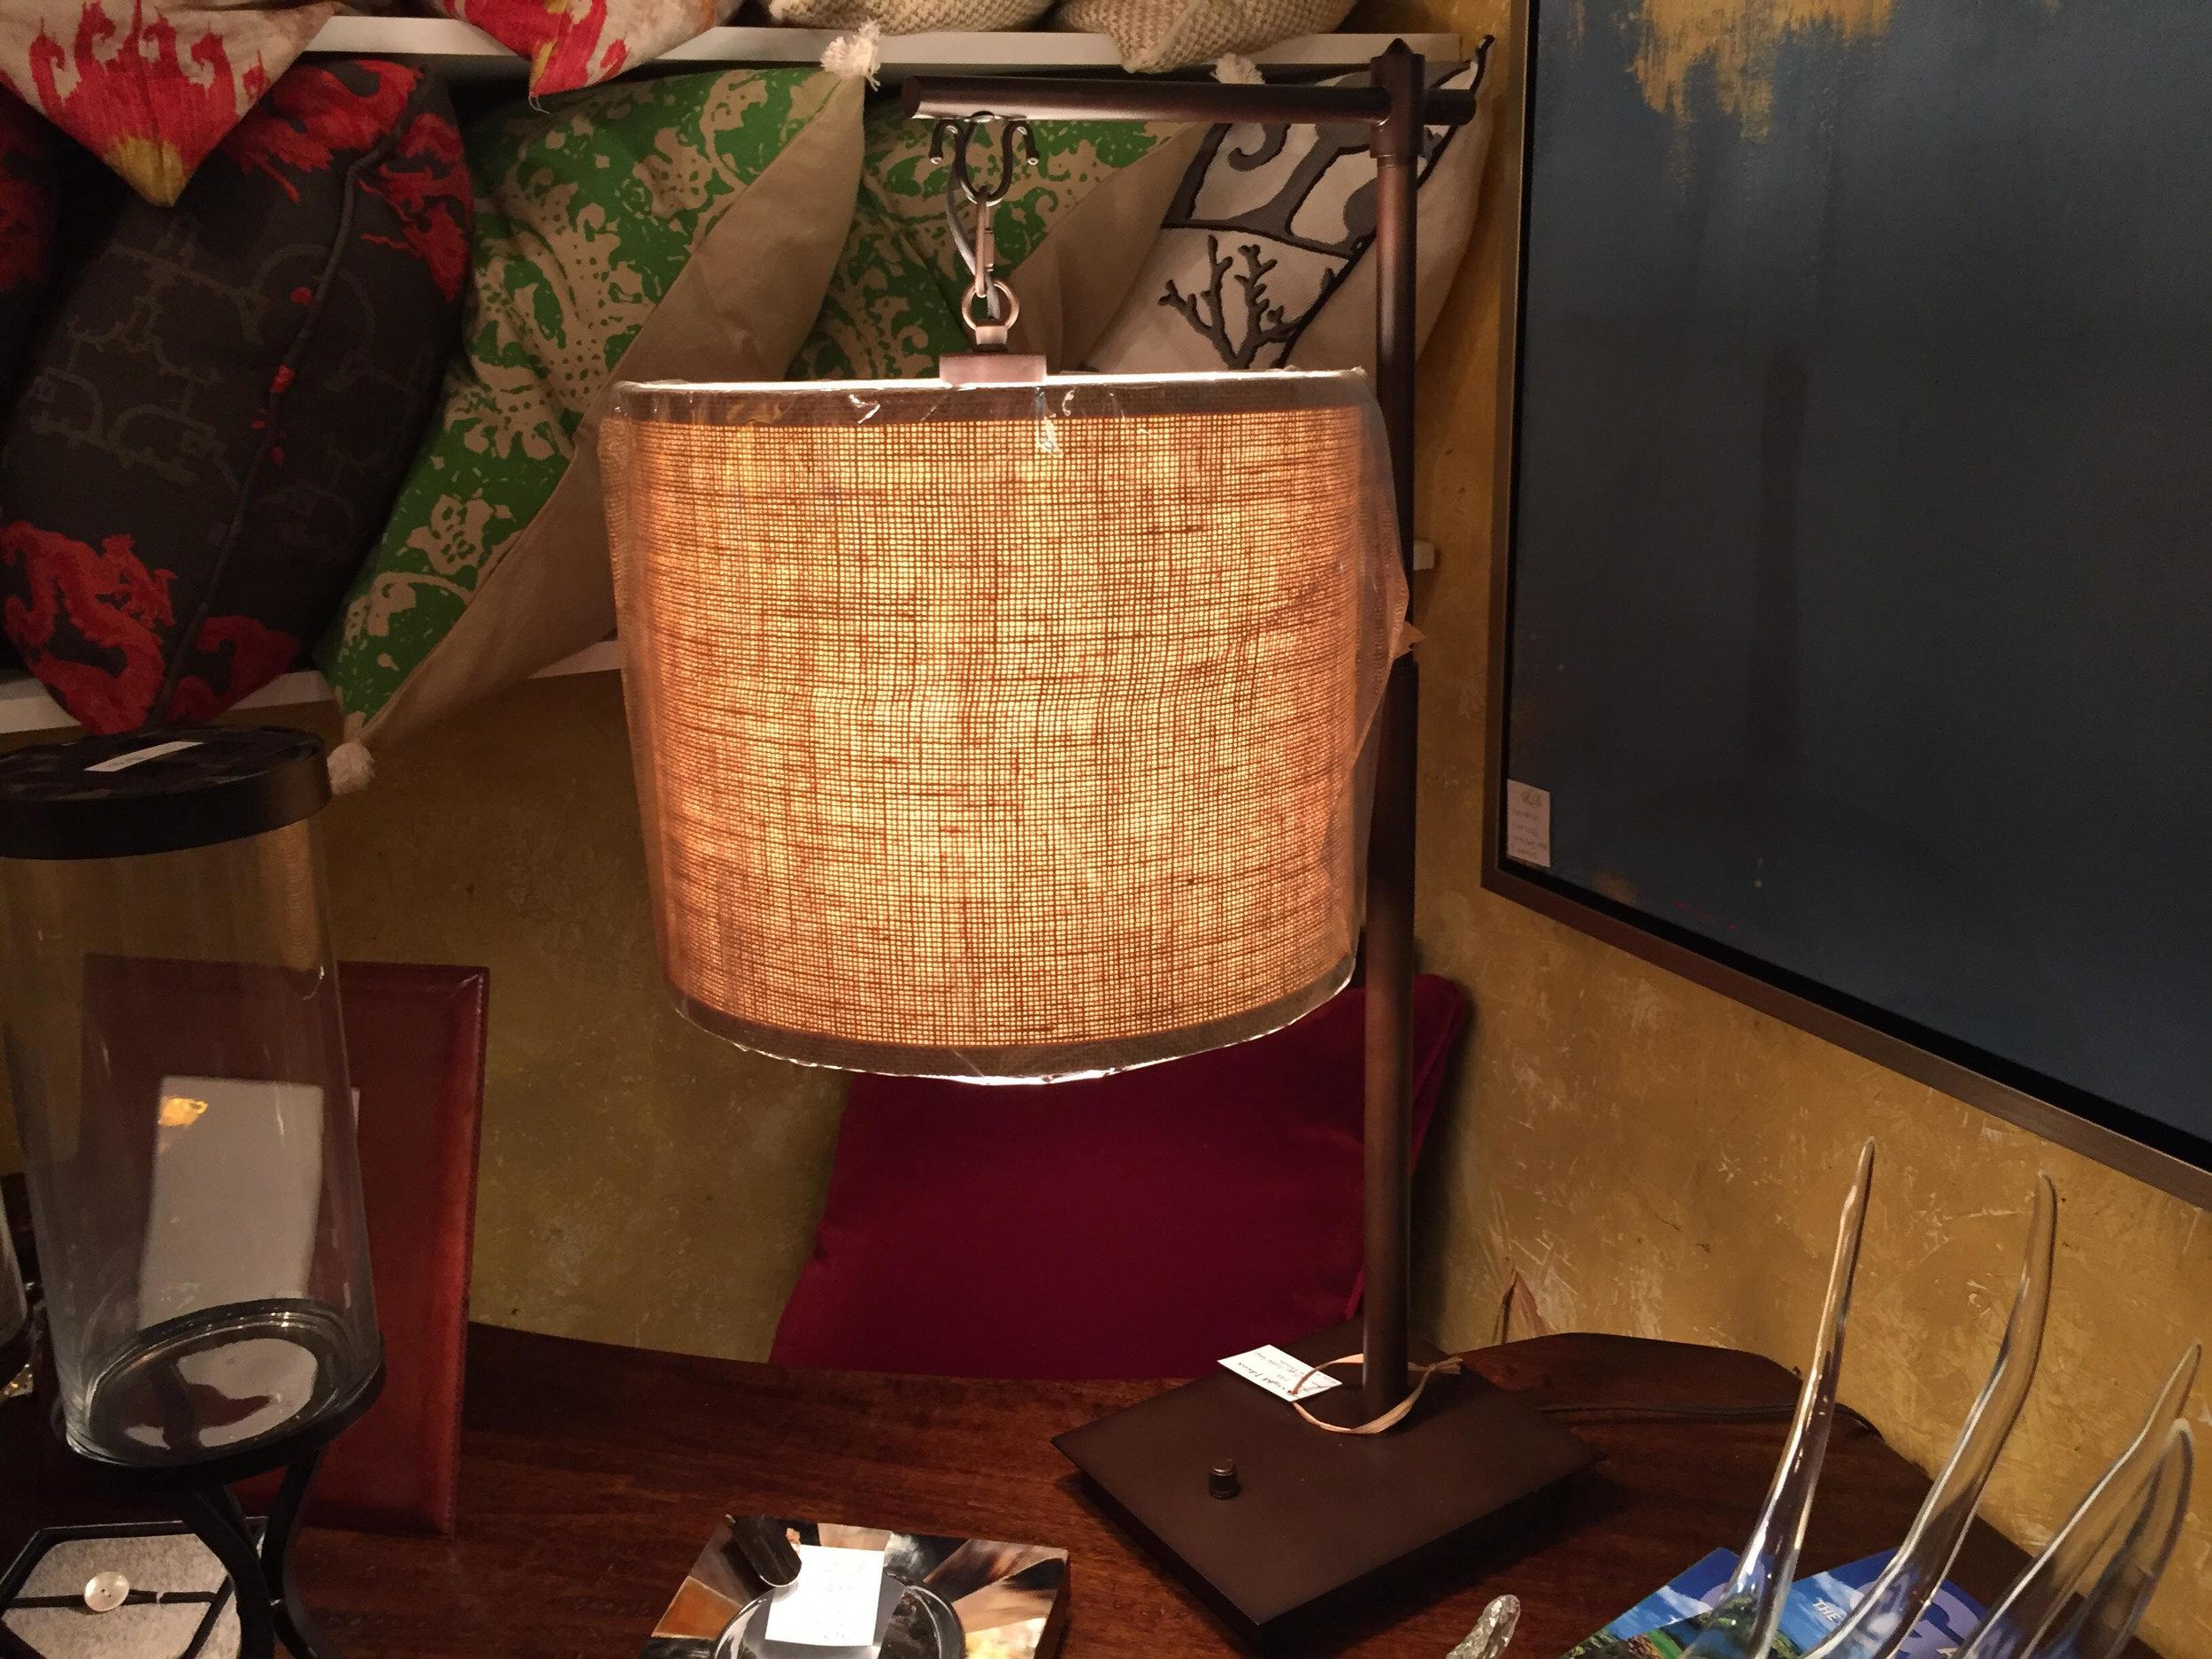 Hanging Desk Lamp - $198